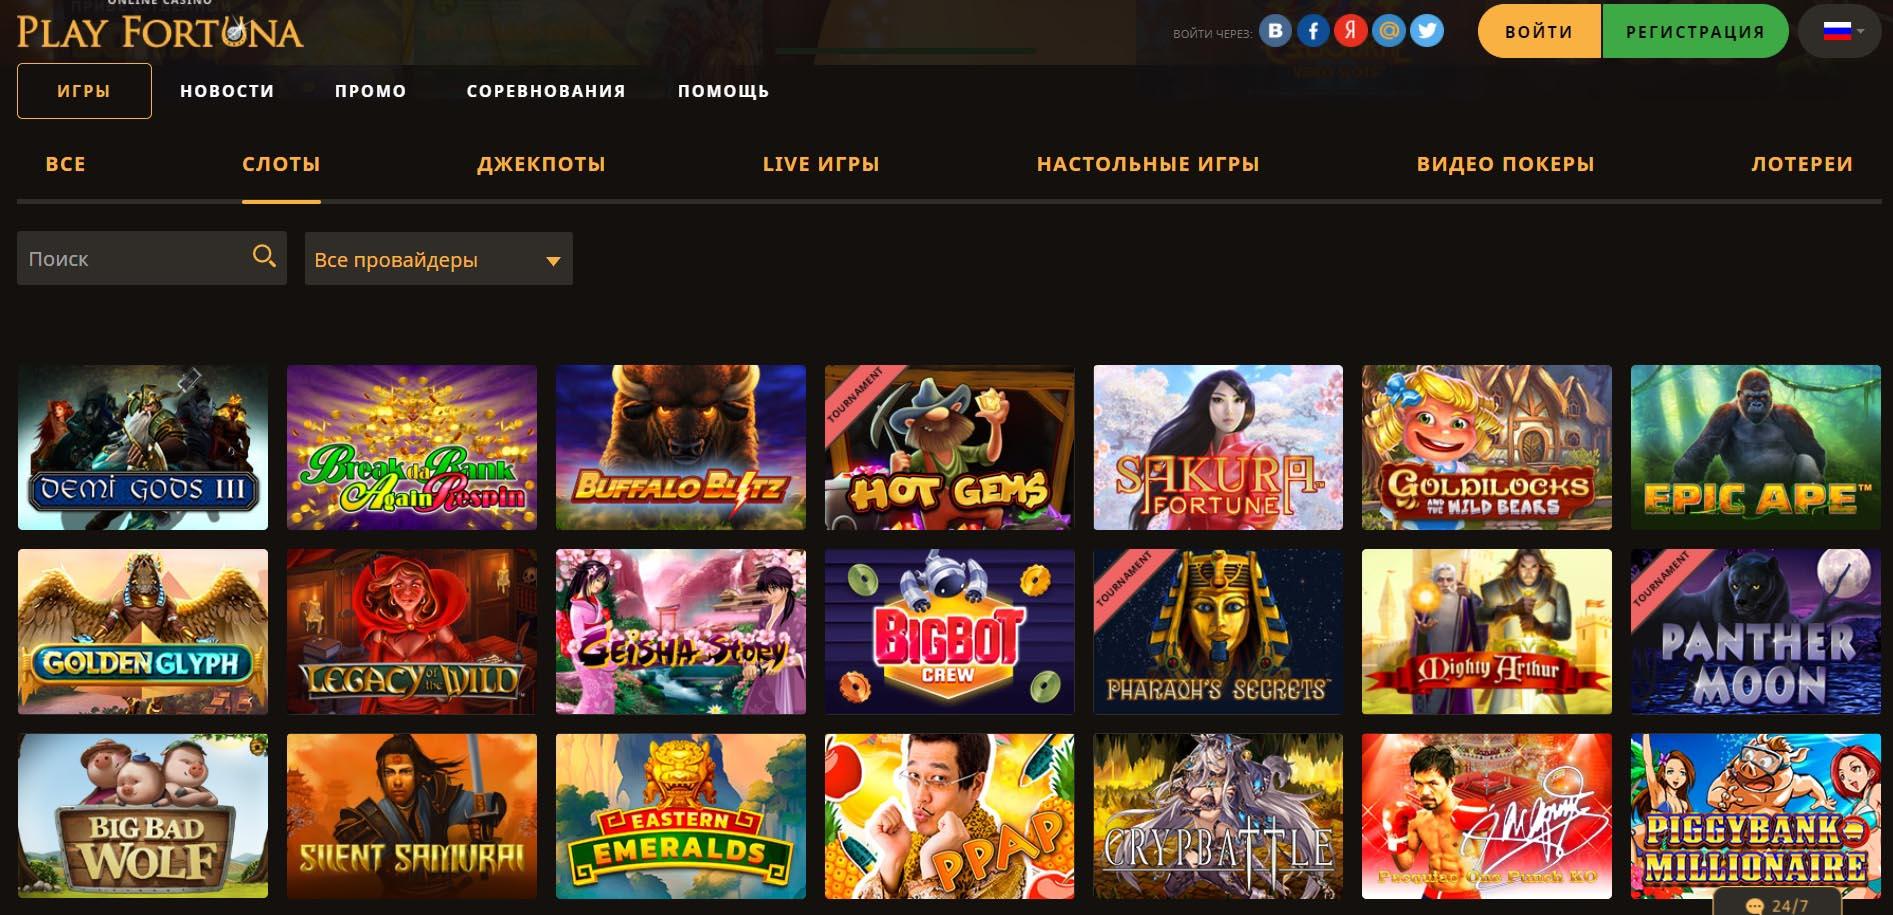 играть fortuna онлайн play казино